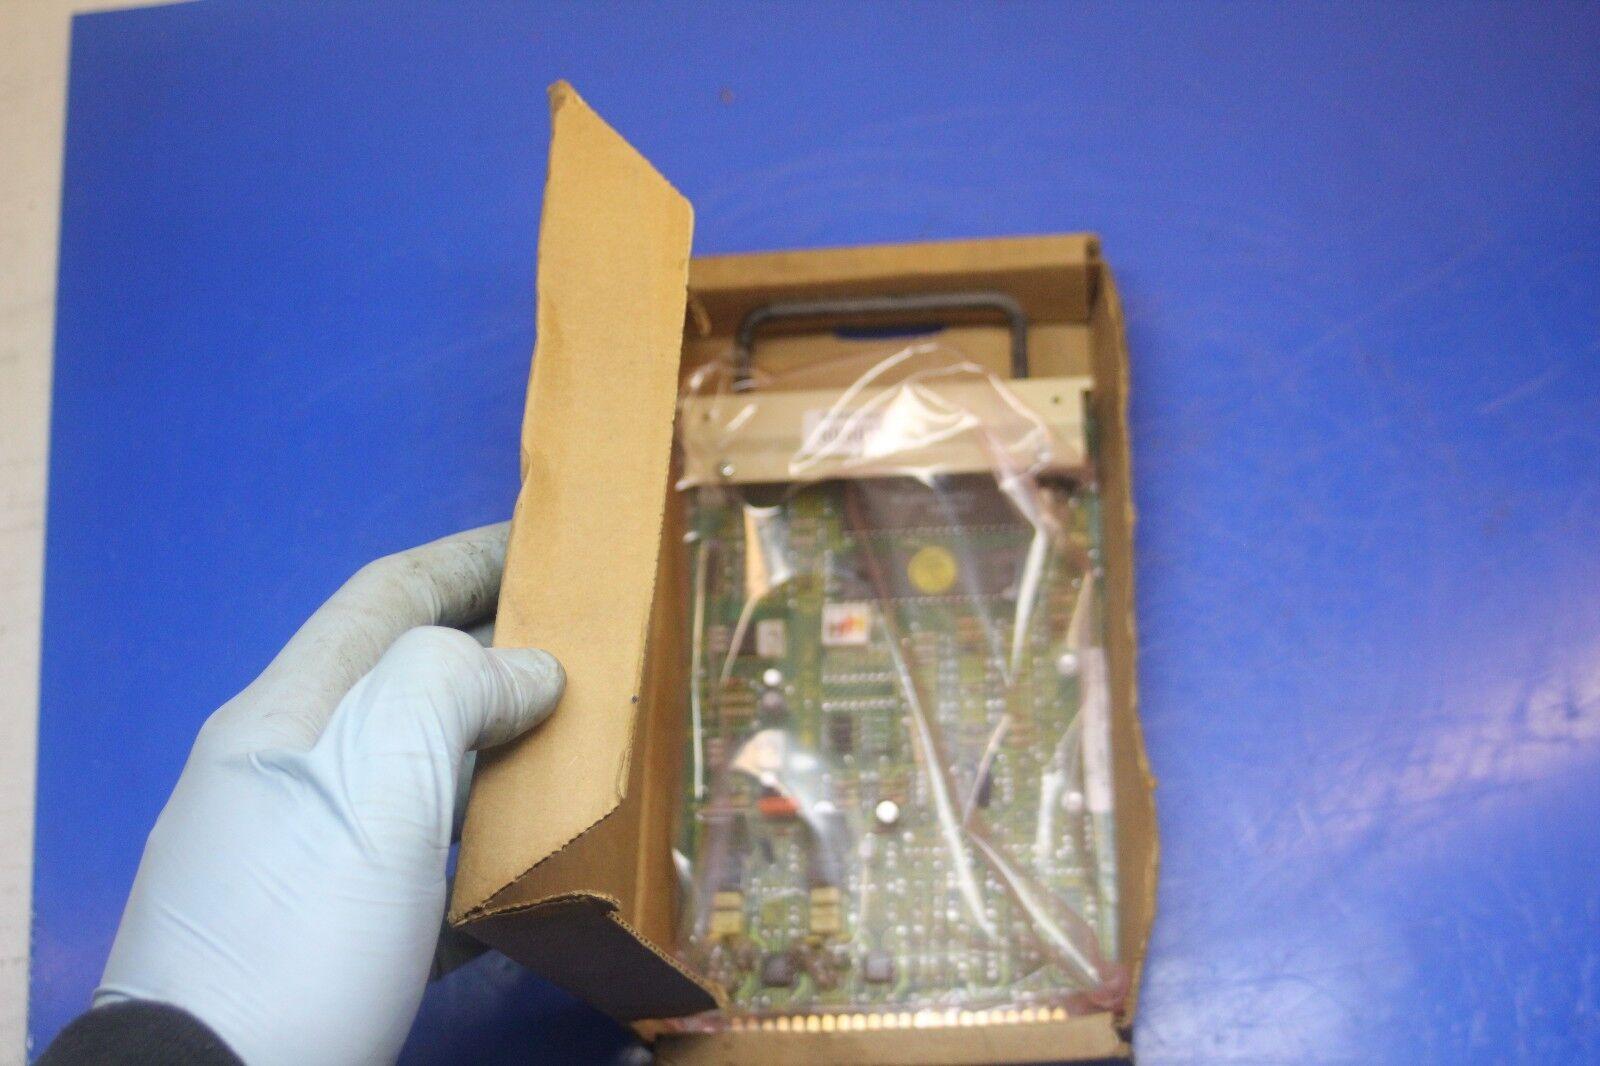 222N Dual Channel Loop Detector Part no. 4619 s n 186270 new in the box